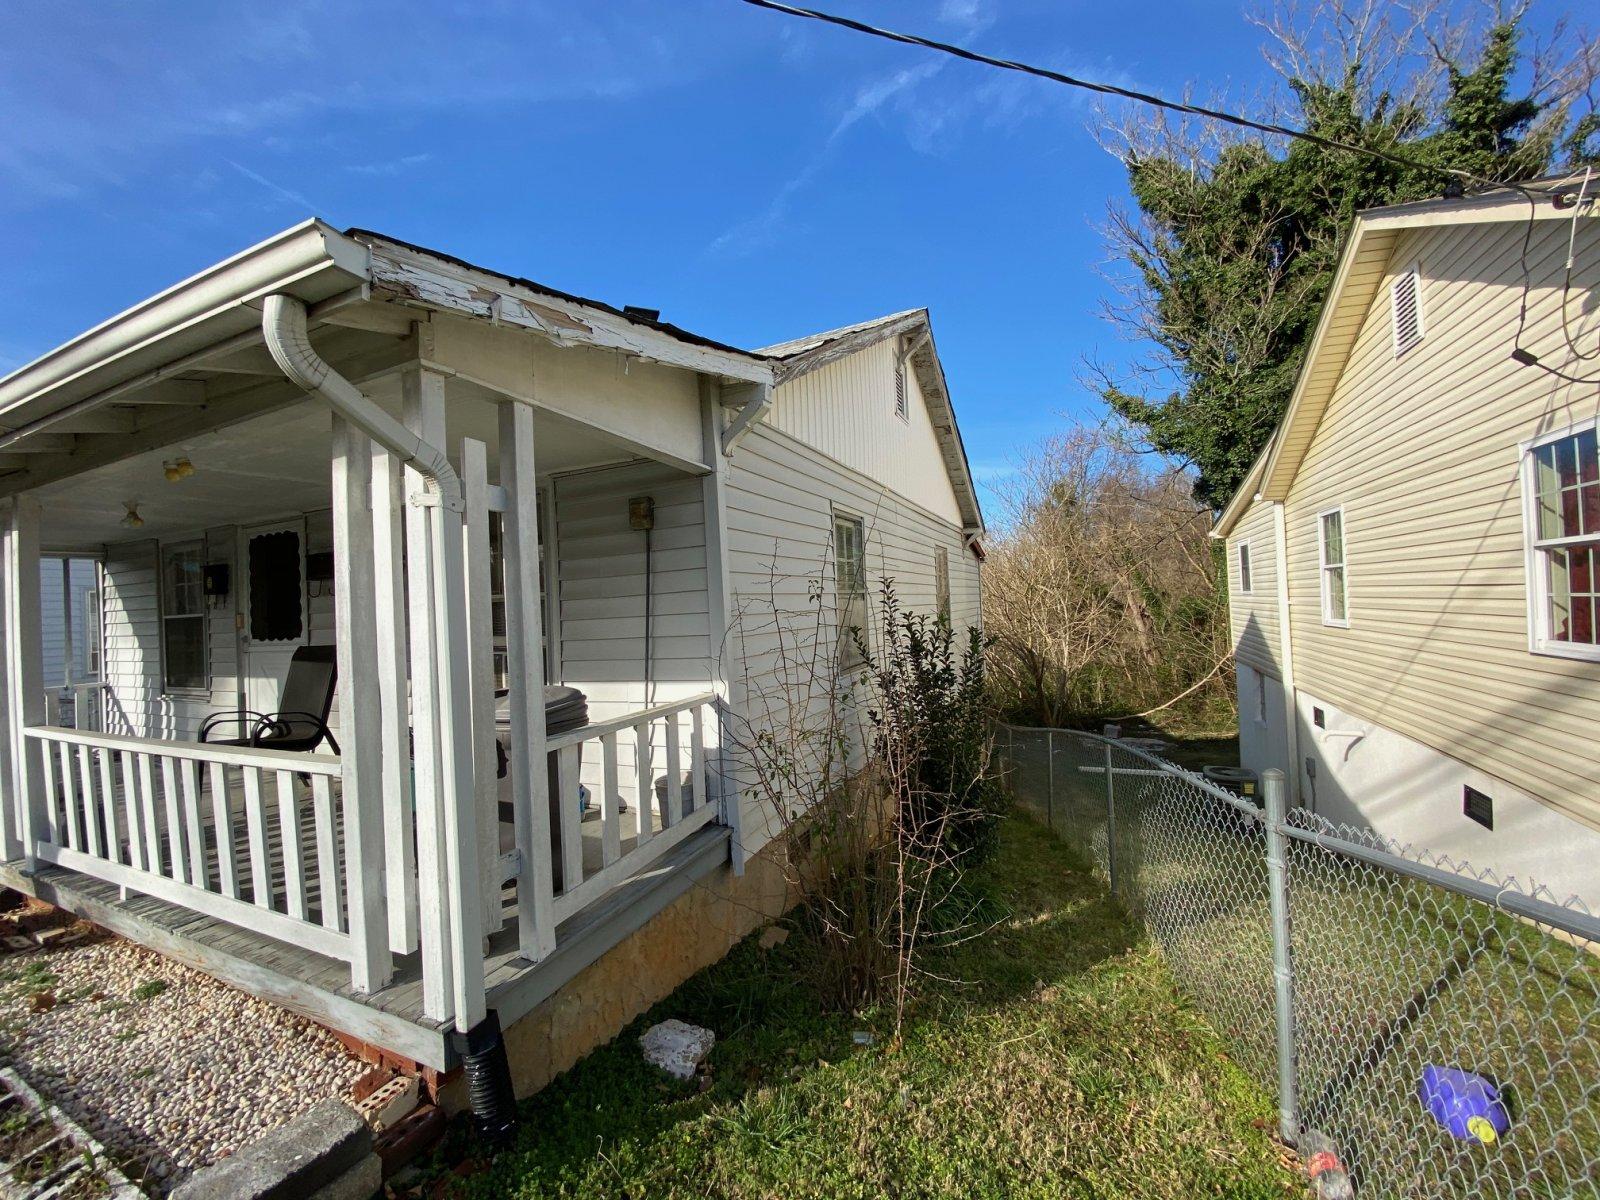 contractor discount property in Winston Salem NC off market discount property in Winston Salem NC